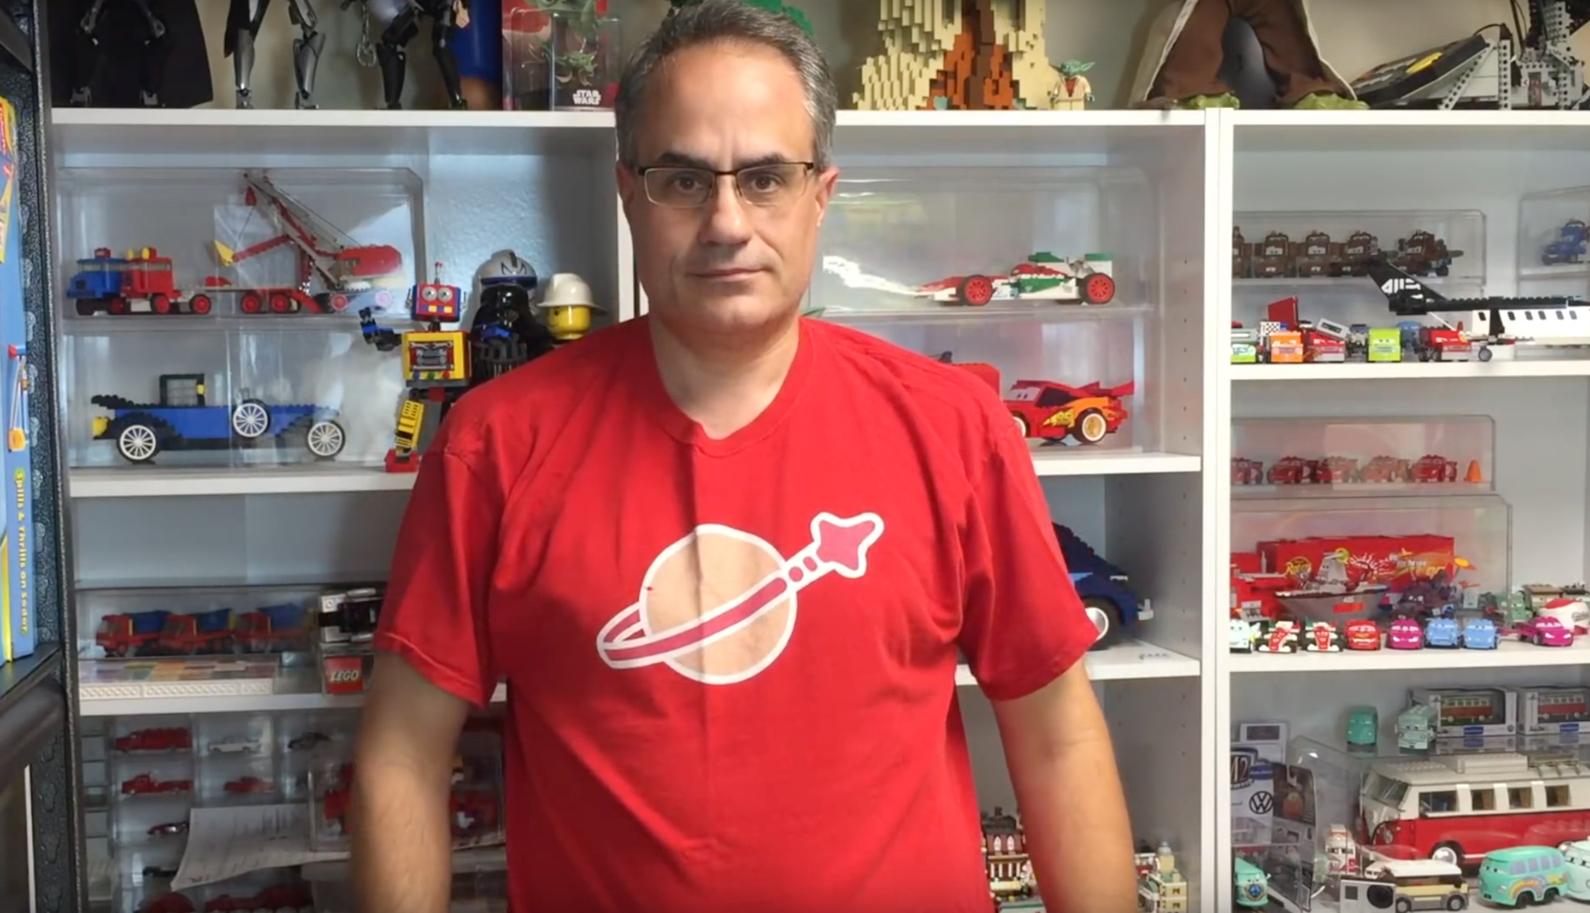 Joseph Olson - YouTube content creator.